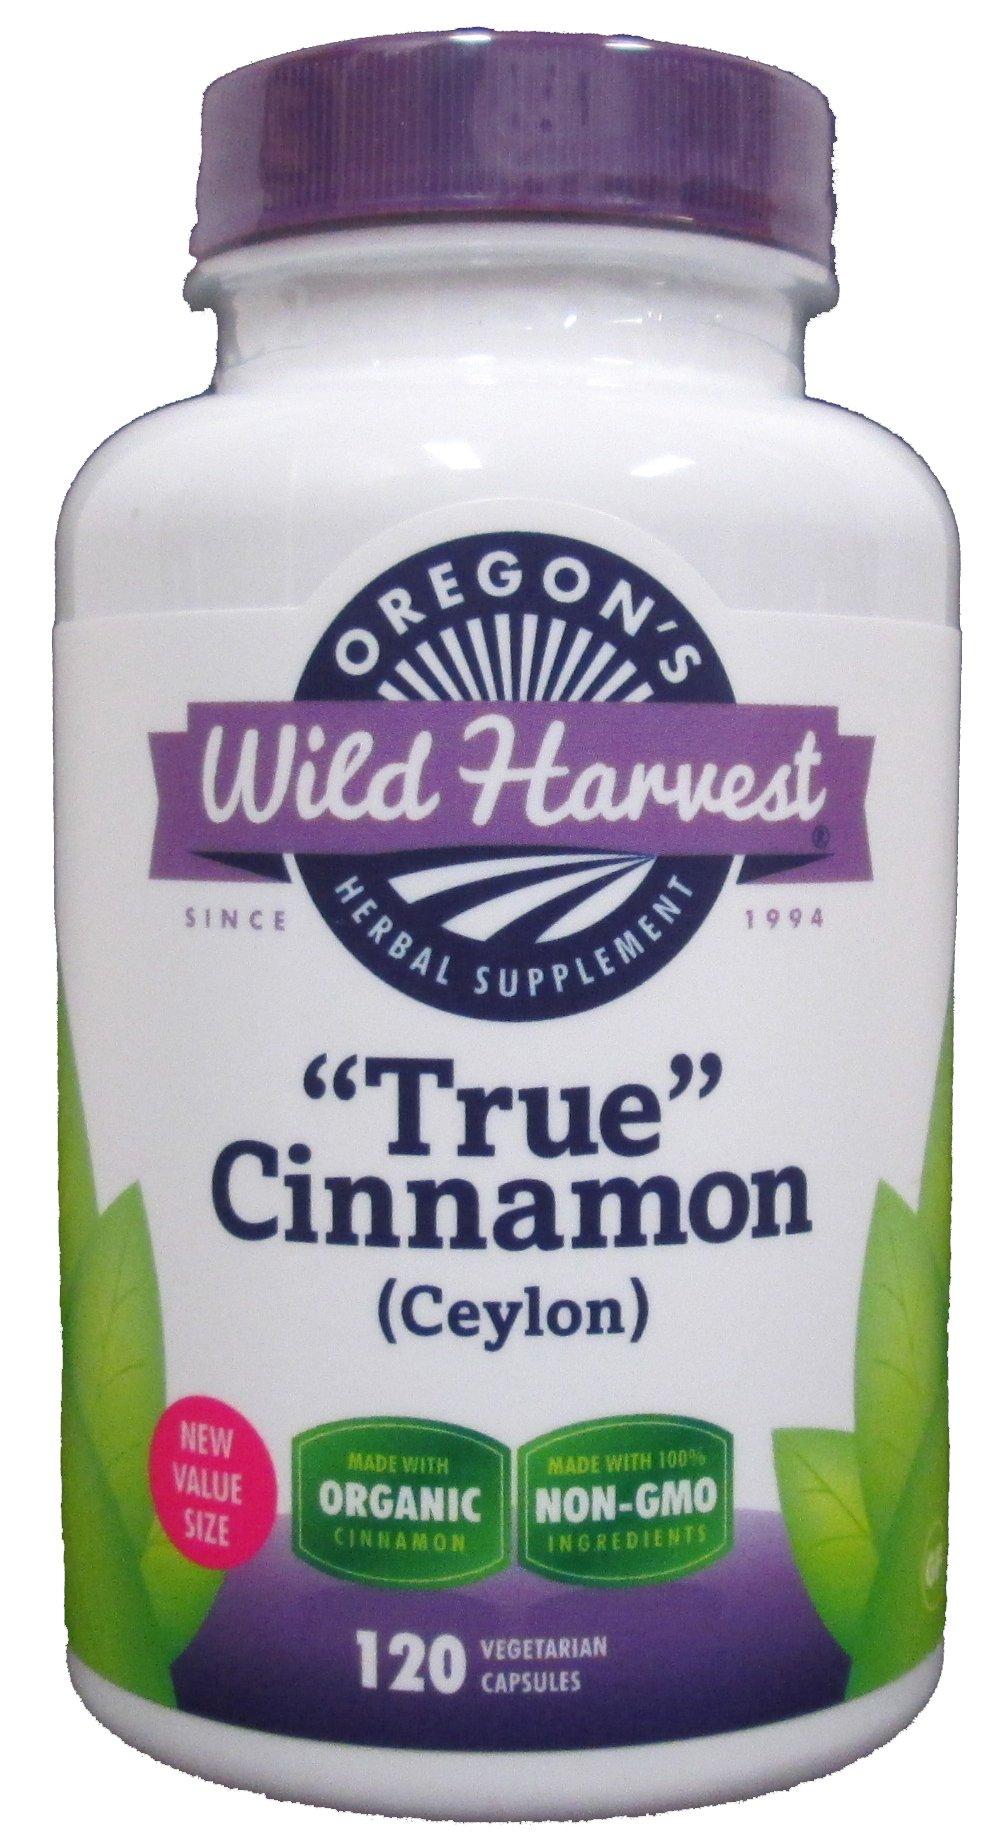 True Cinnamon (Ceylon) - 120 Veg Capsules - Oregon's Wild Harvest